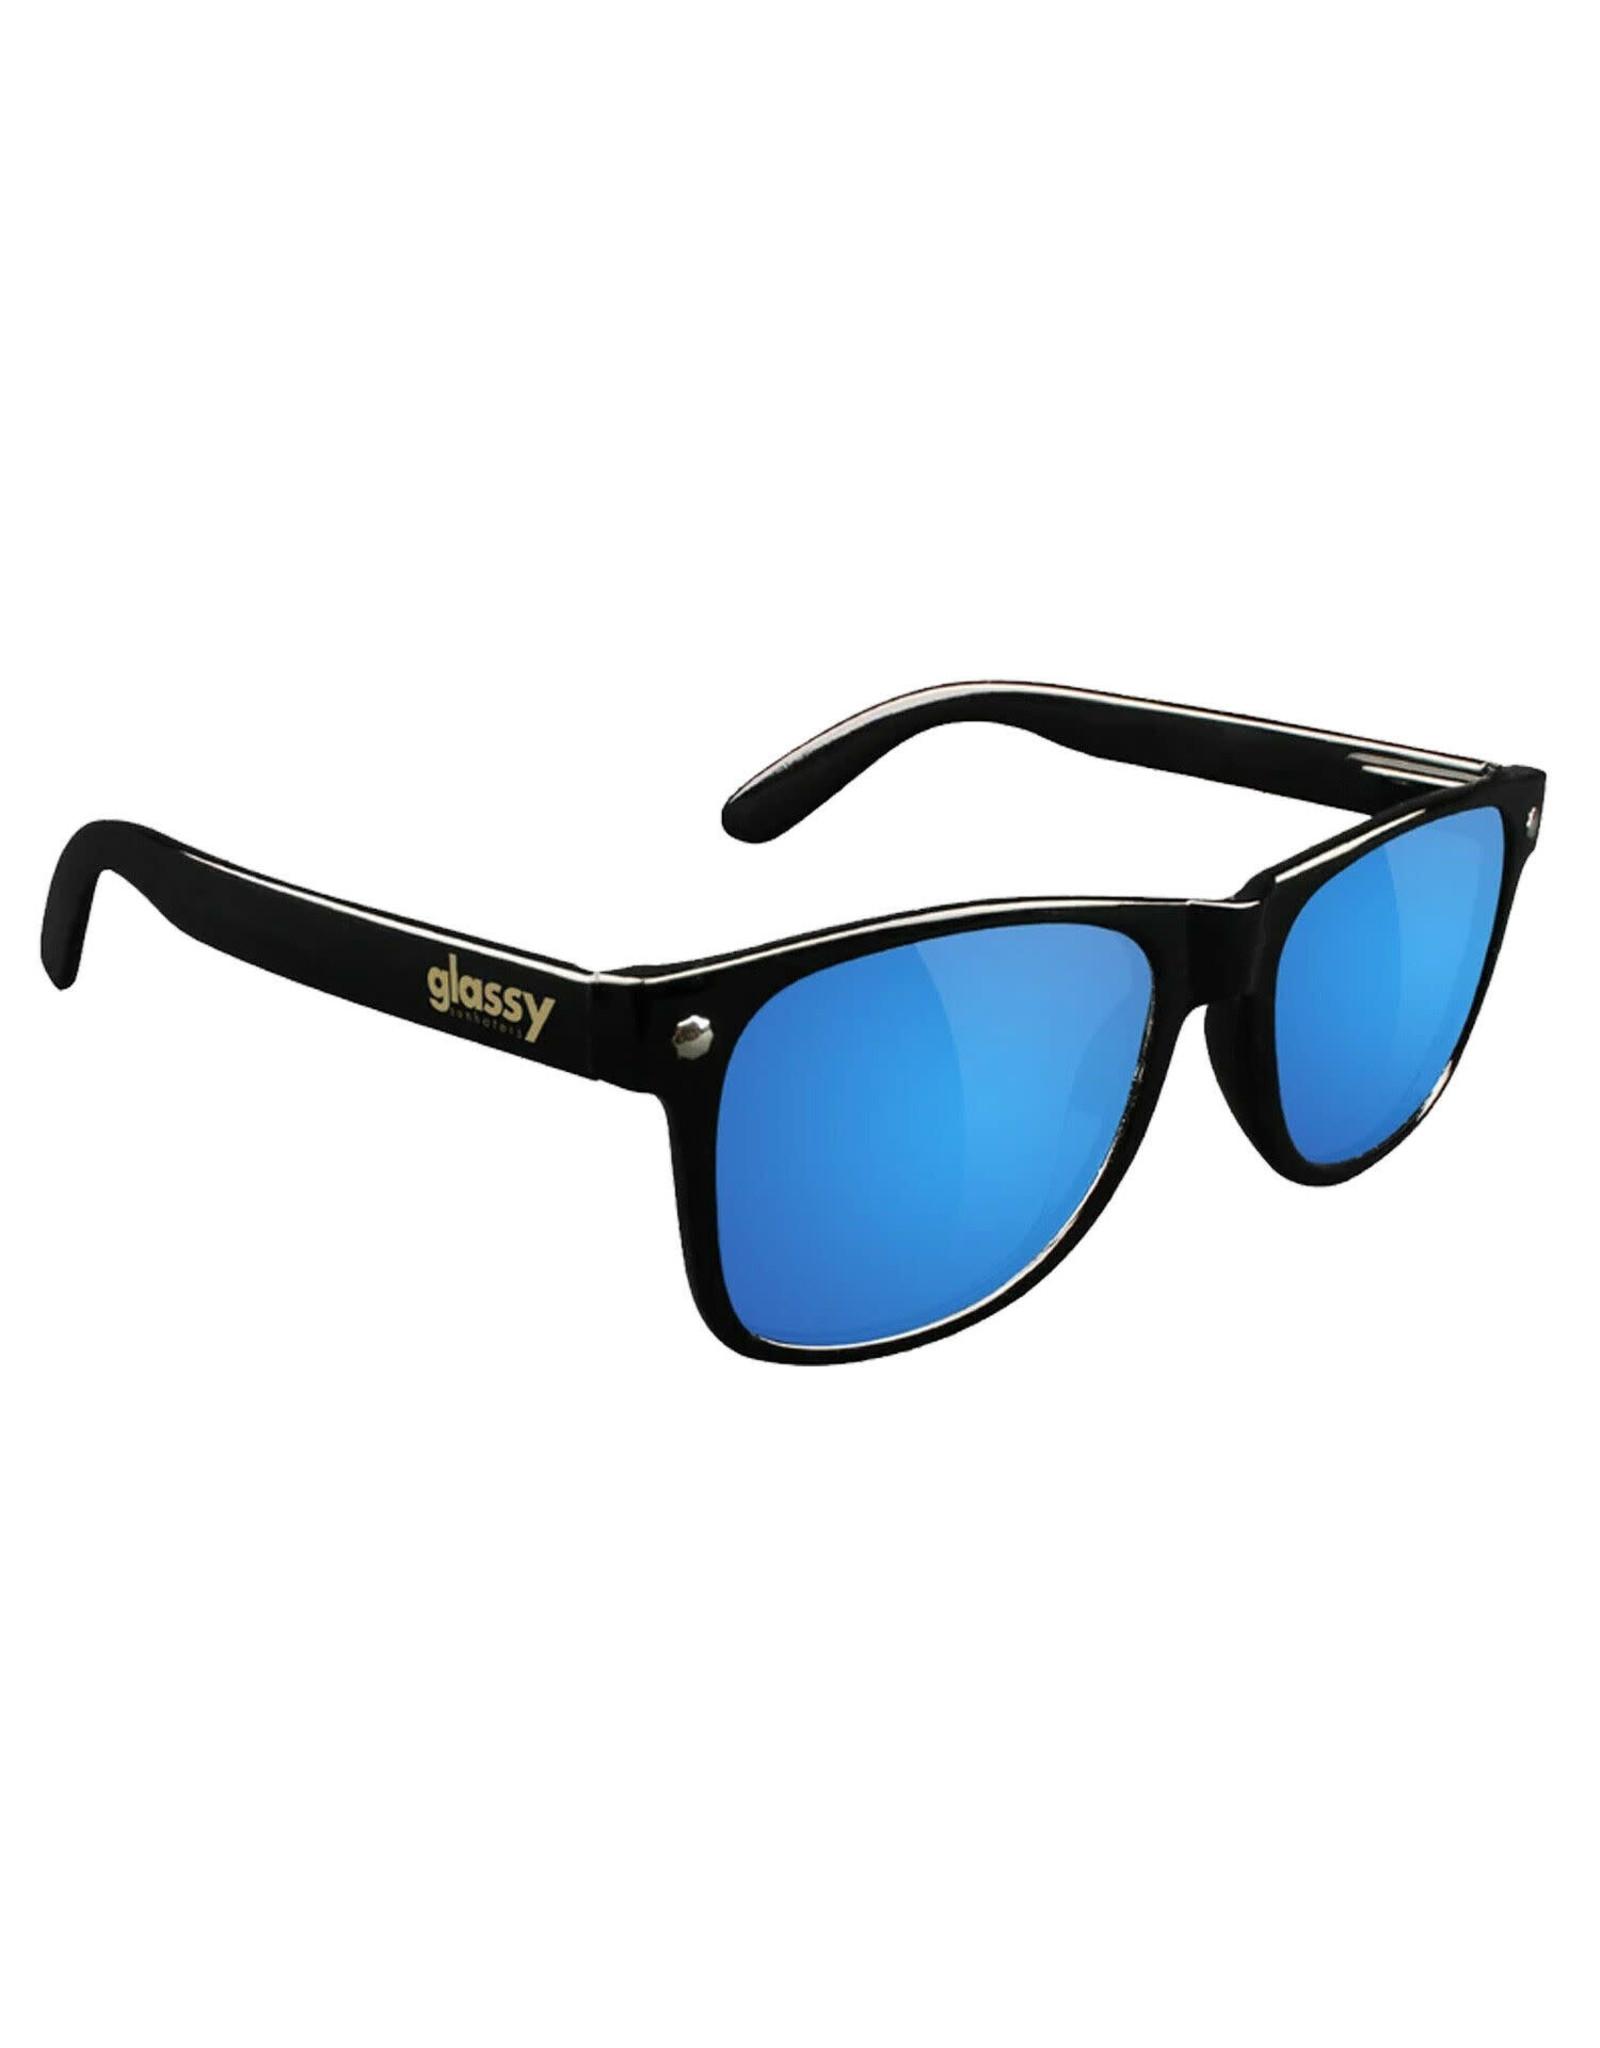 Glassy Sunglasses Glassy Sunglasses Leonard (Black Gloss/Blue Mirror Polarized Lens)